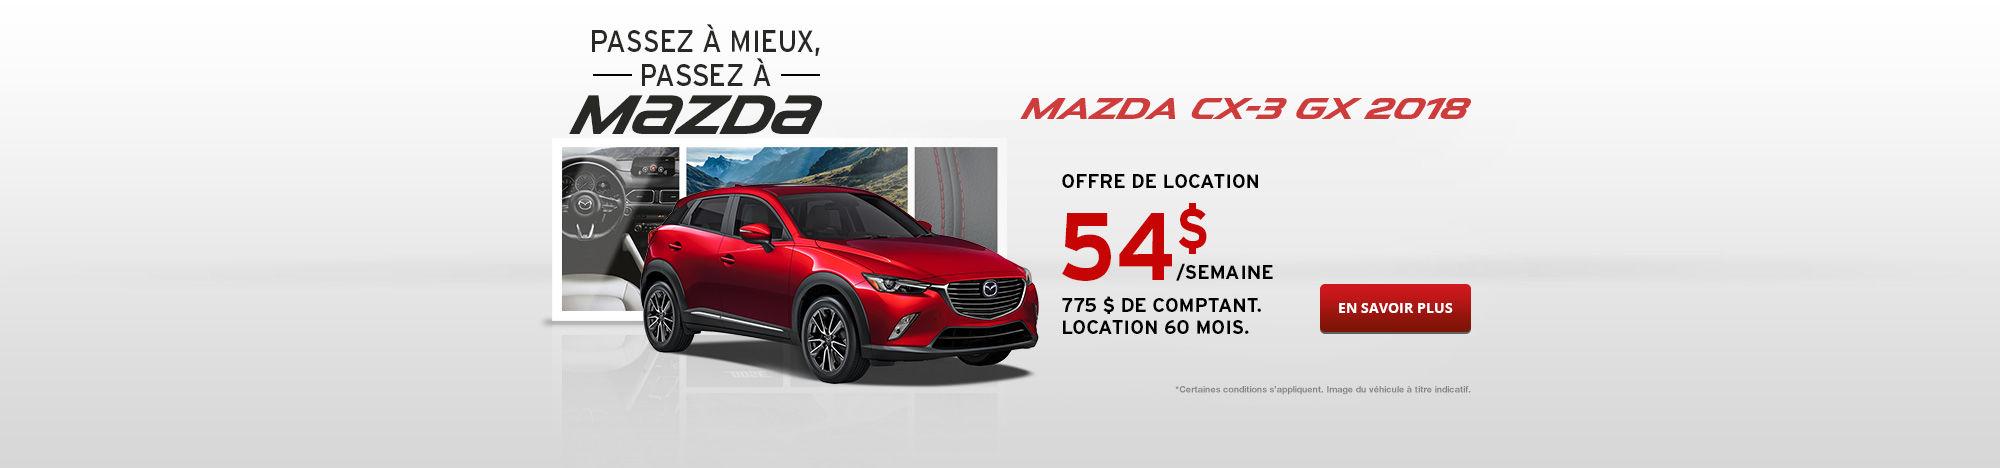 Passez à Mazda Septembre - CX-3